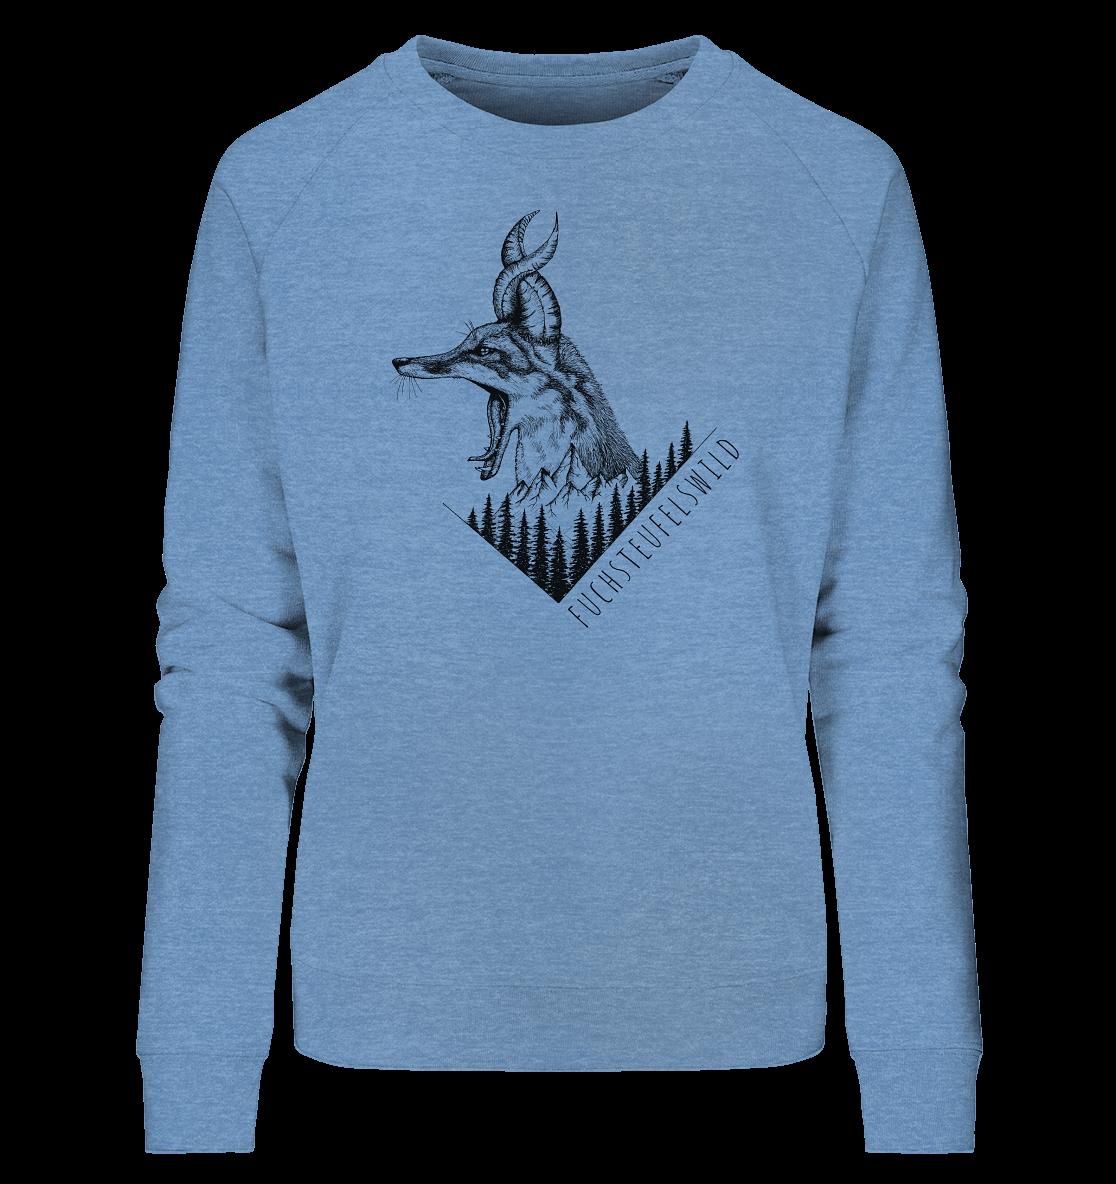 front-ladies-organic-sweatshirt-6090c4-1116x-4.png